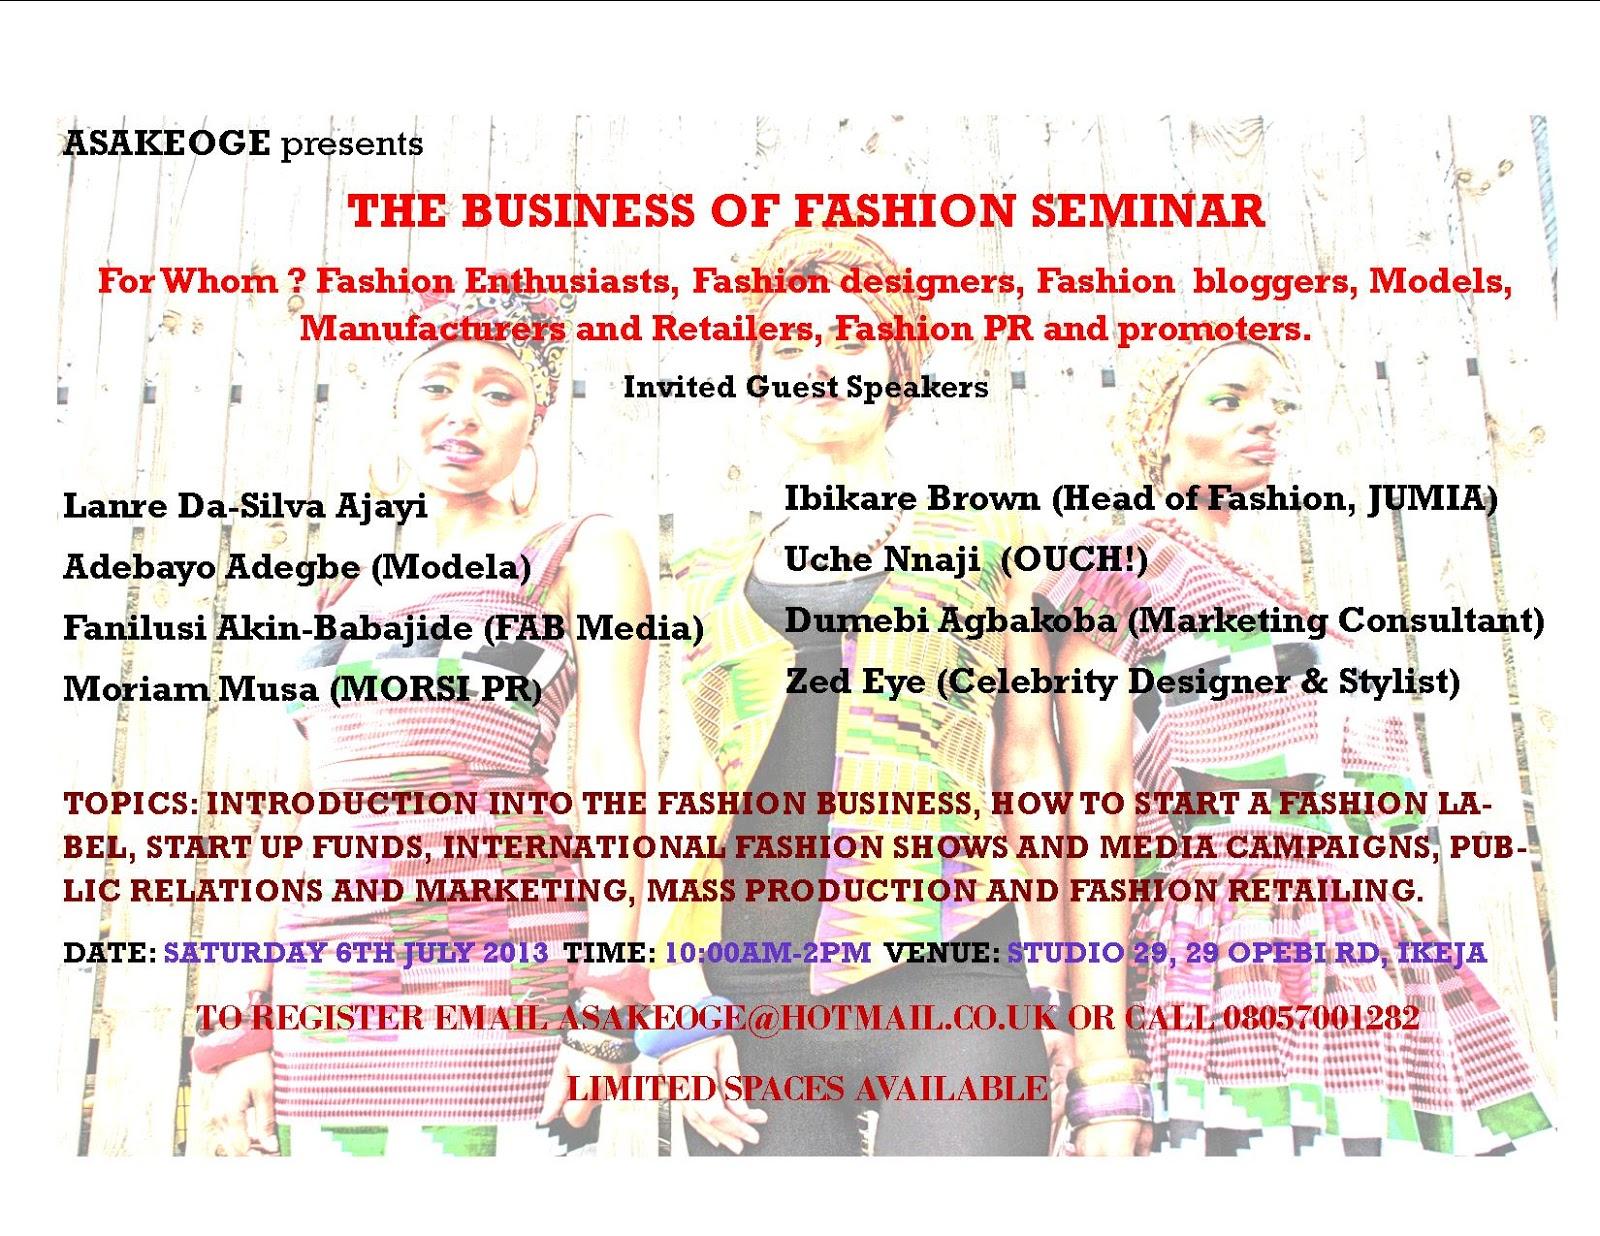 Asakeoge Presents The Business Of Fashion Seminar This Saturday